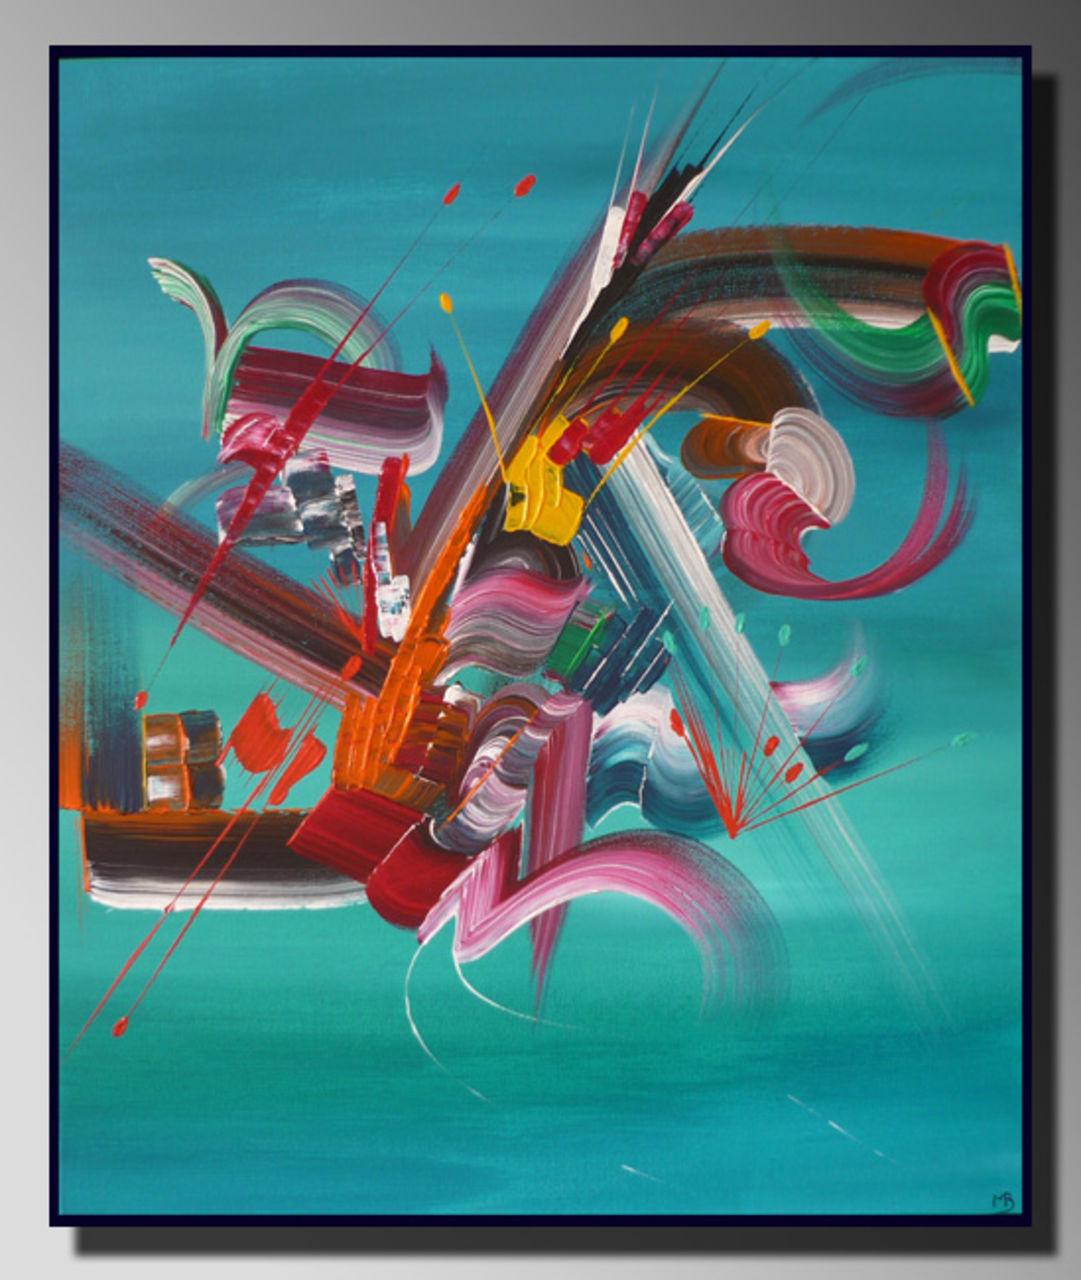 Martine BELFODIL Artiste Peintre professionnelle Peinture abstraite Fusion